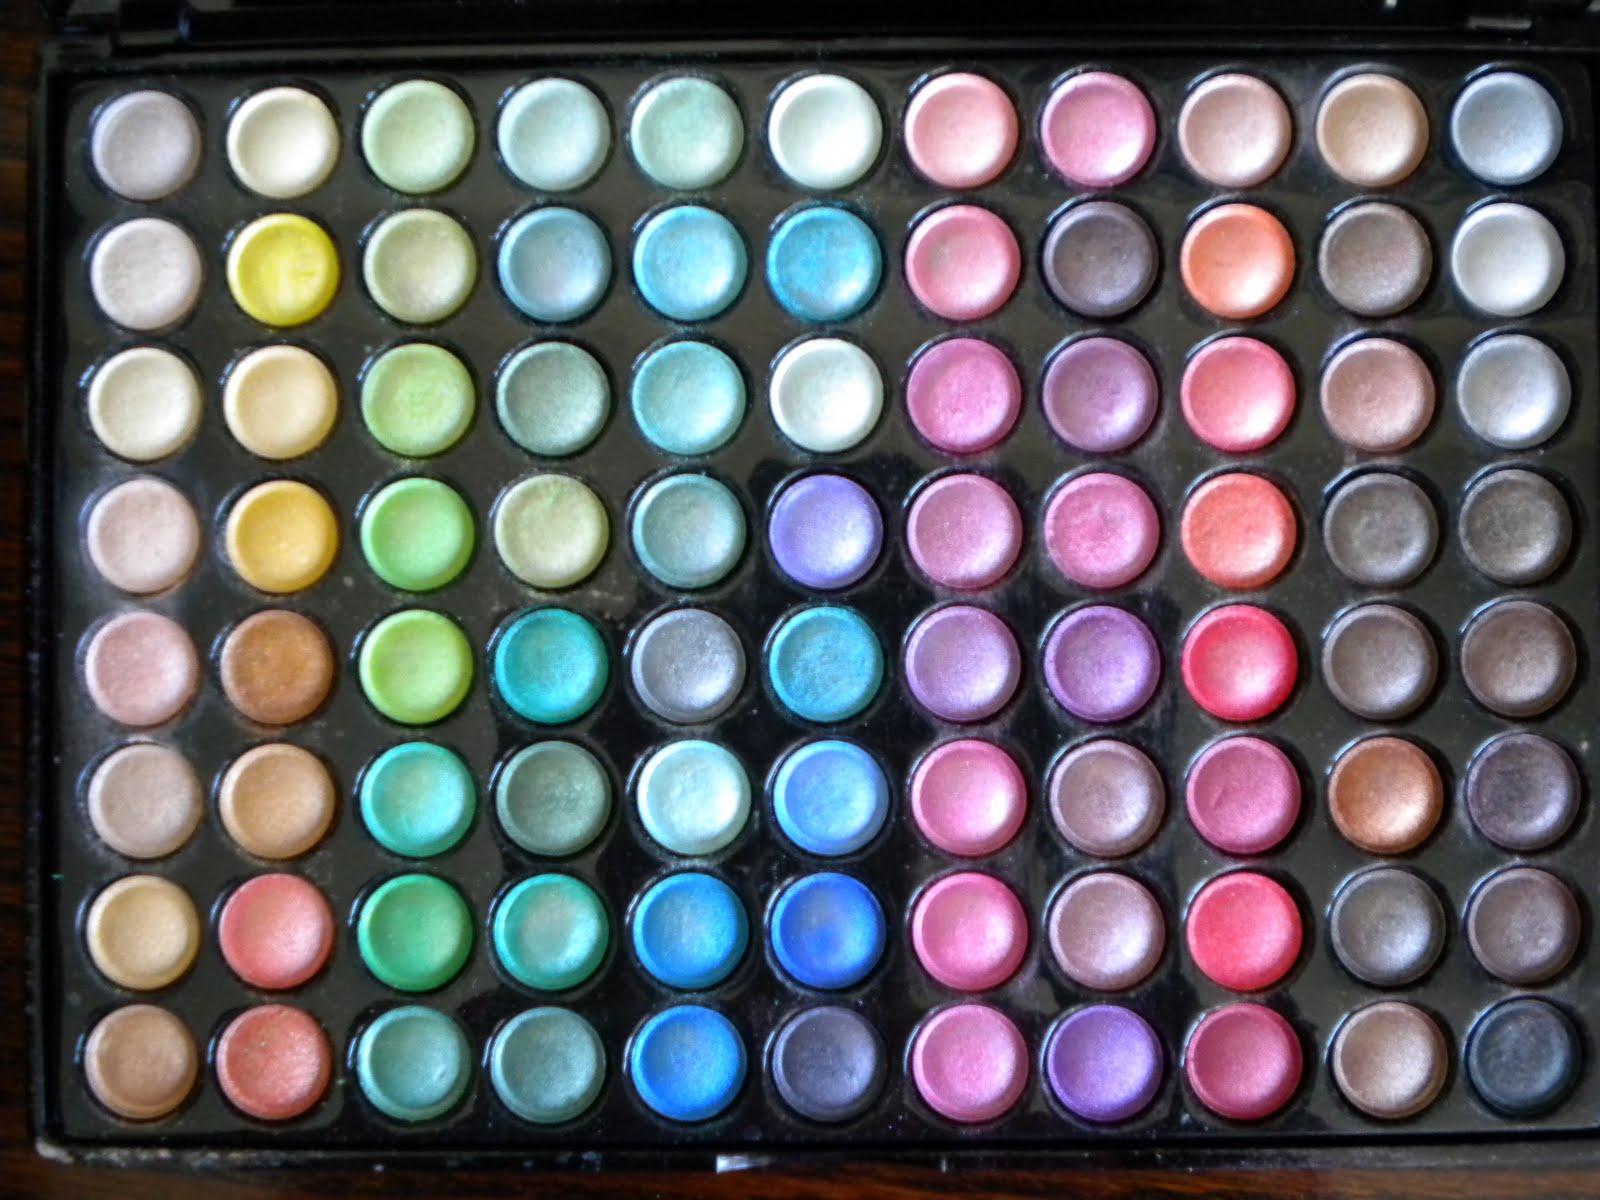 karal 39 s e shop palette de maquillage 88 couleurs 15. Black Bedroom Furniture Sets. Home Design Ideas